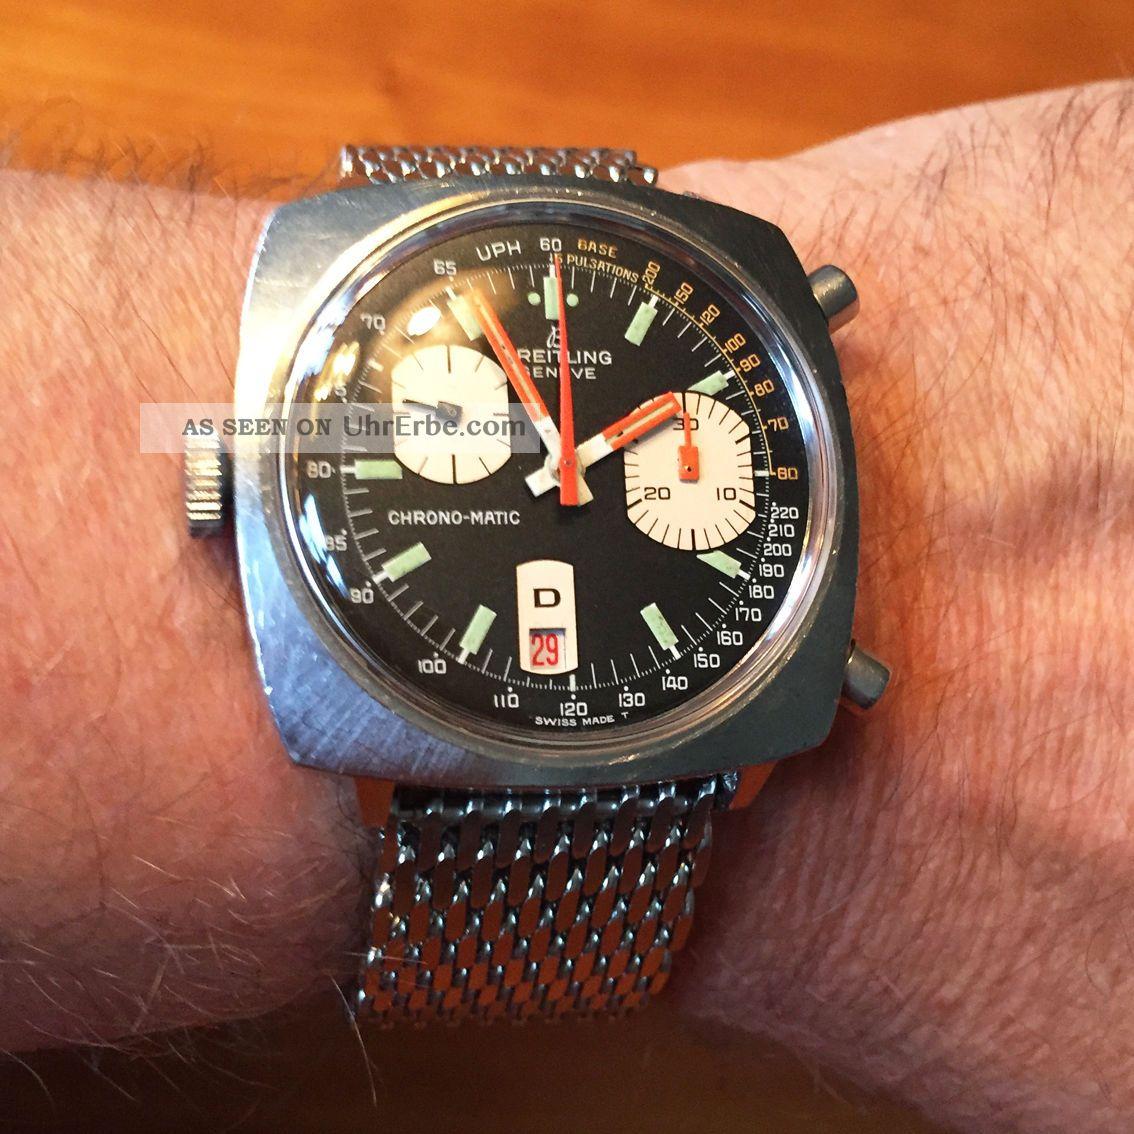 Breitling Chrono - Matic Kaliber15 - 70er Jahre - Ref.  : 2111 - 15 Komplett überholt Armbanduhren Bild